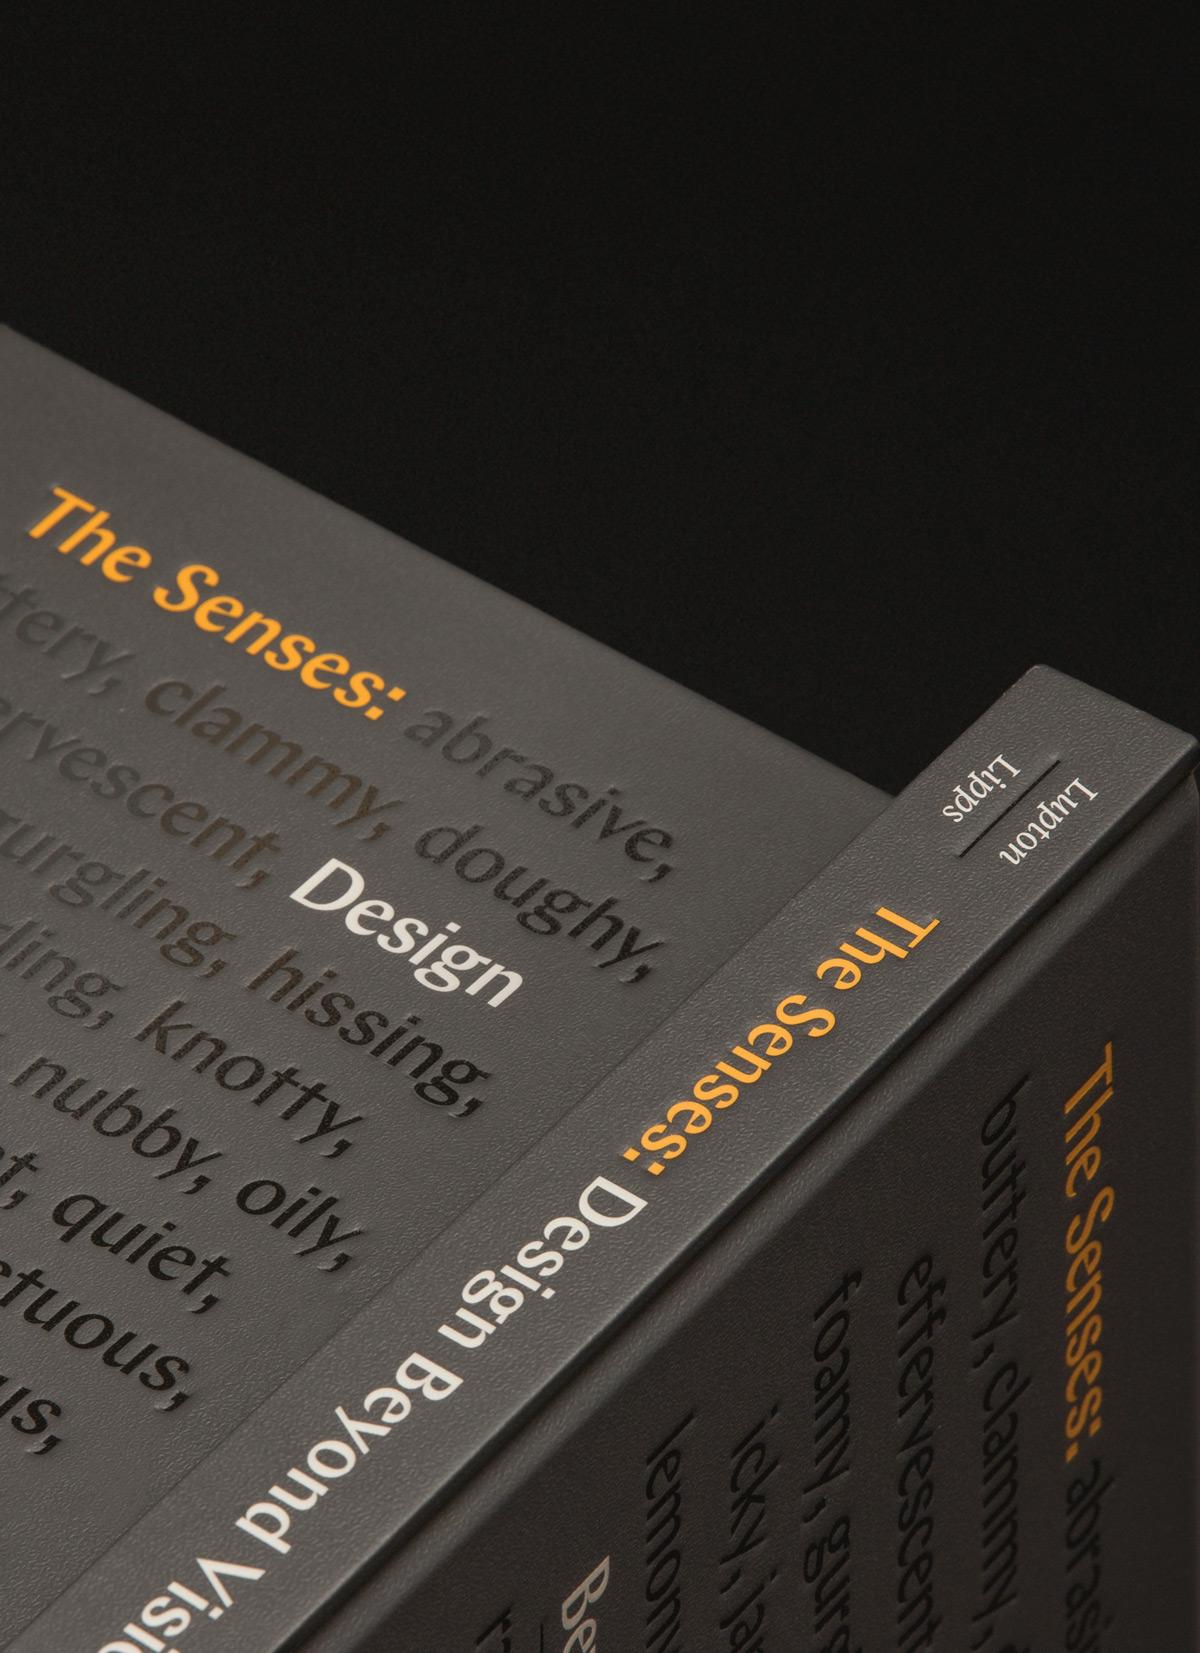 TheSenses_Book_Spine.jpg